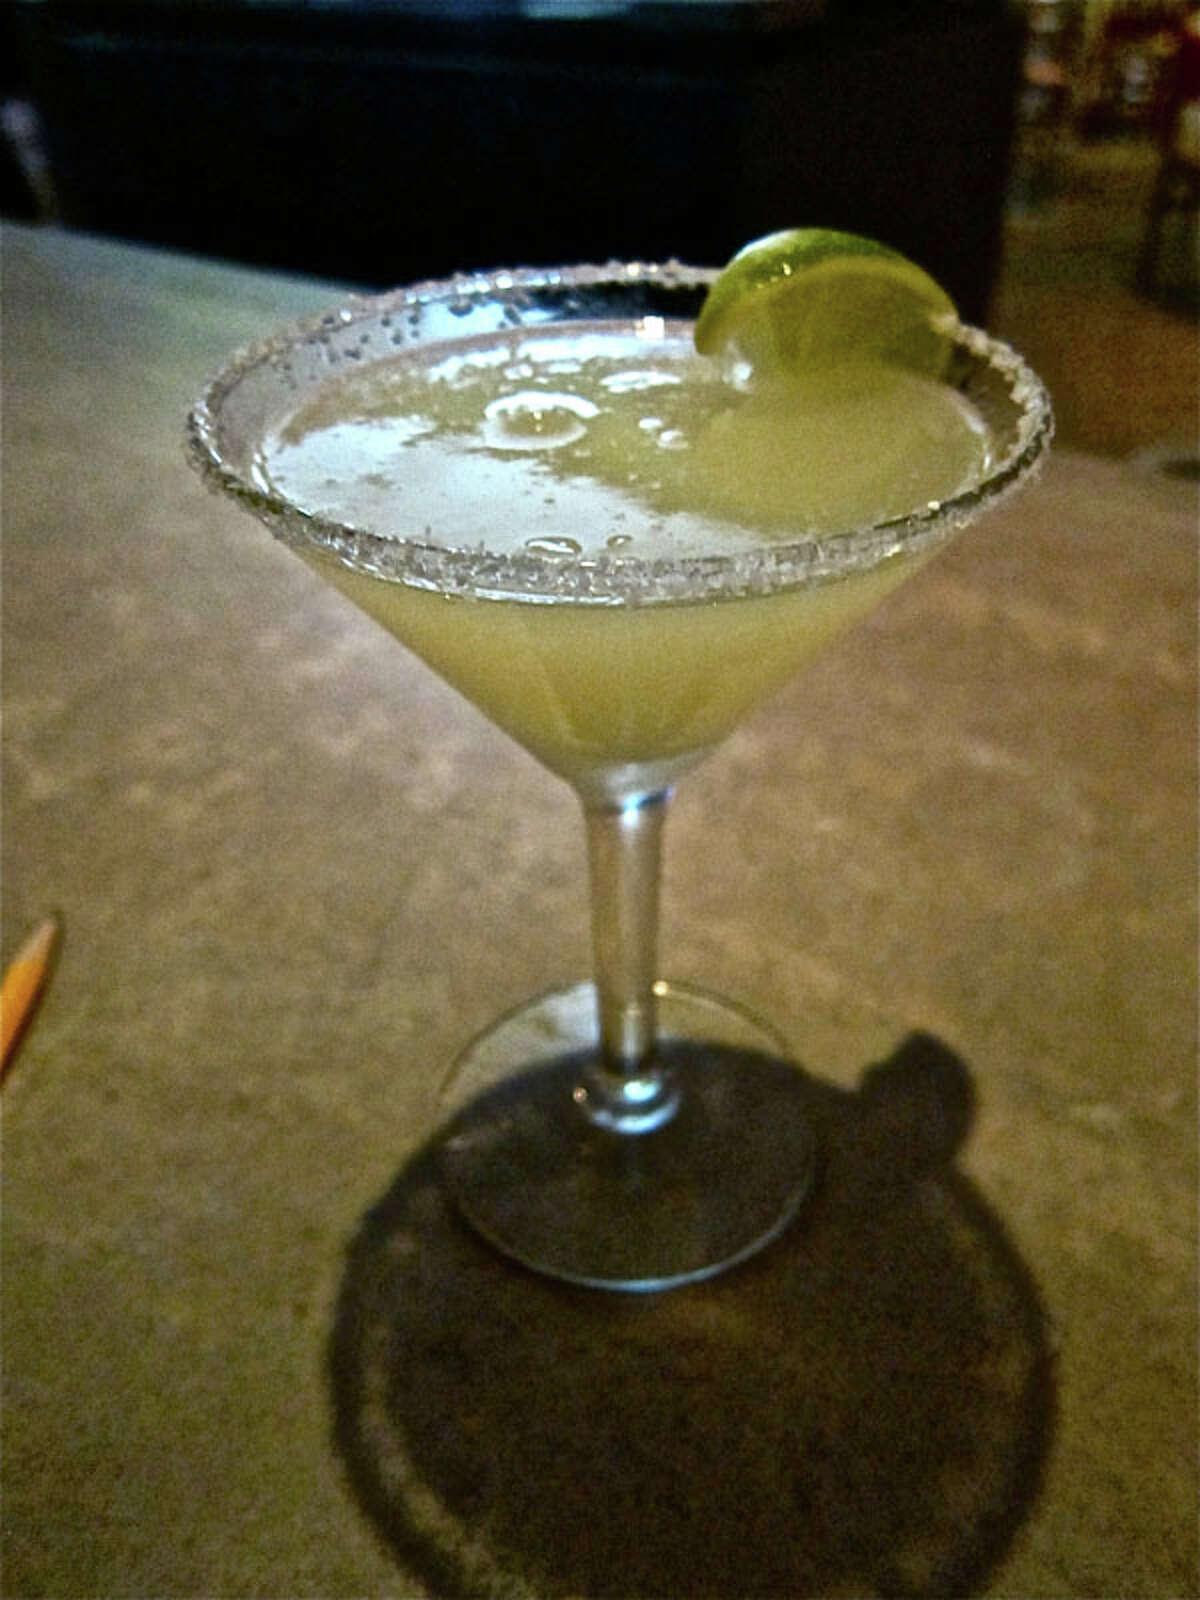 Pico's: Perfect Margarita